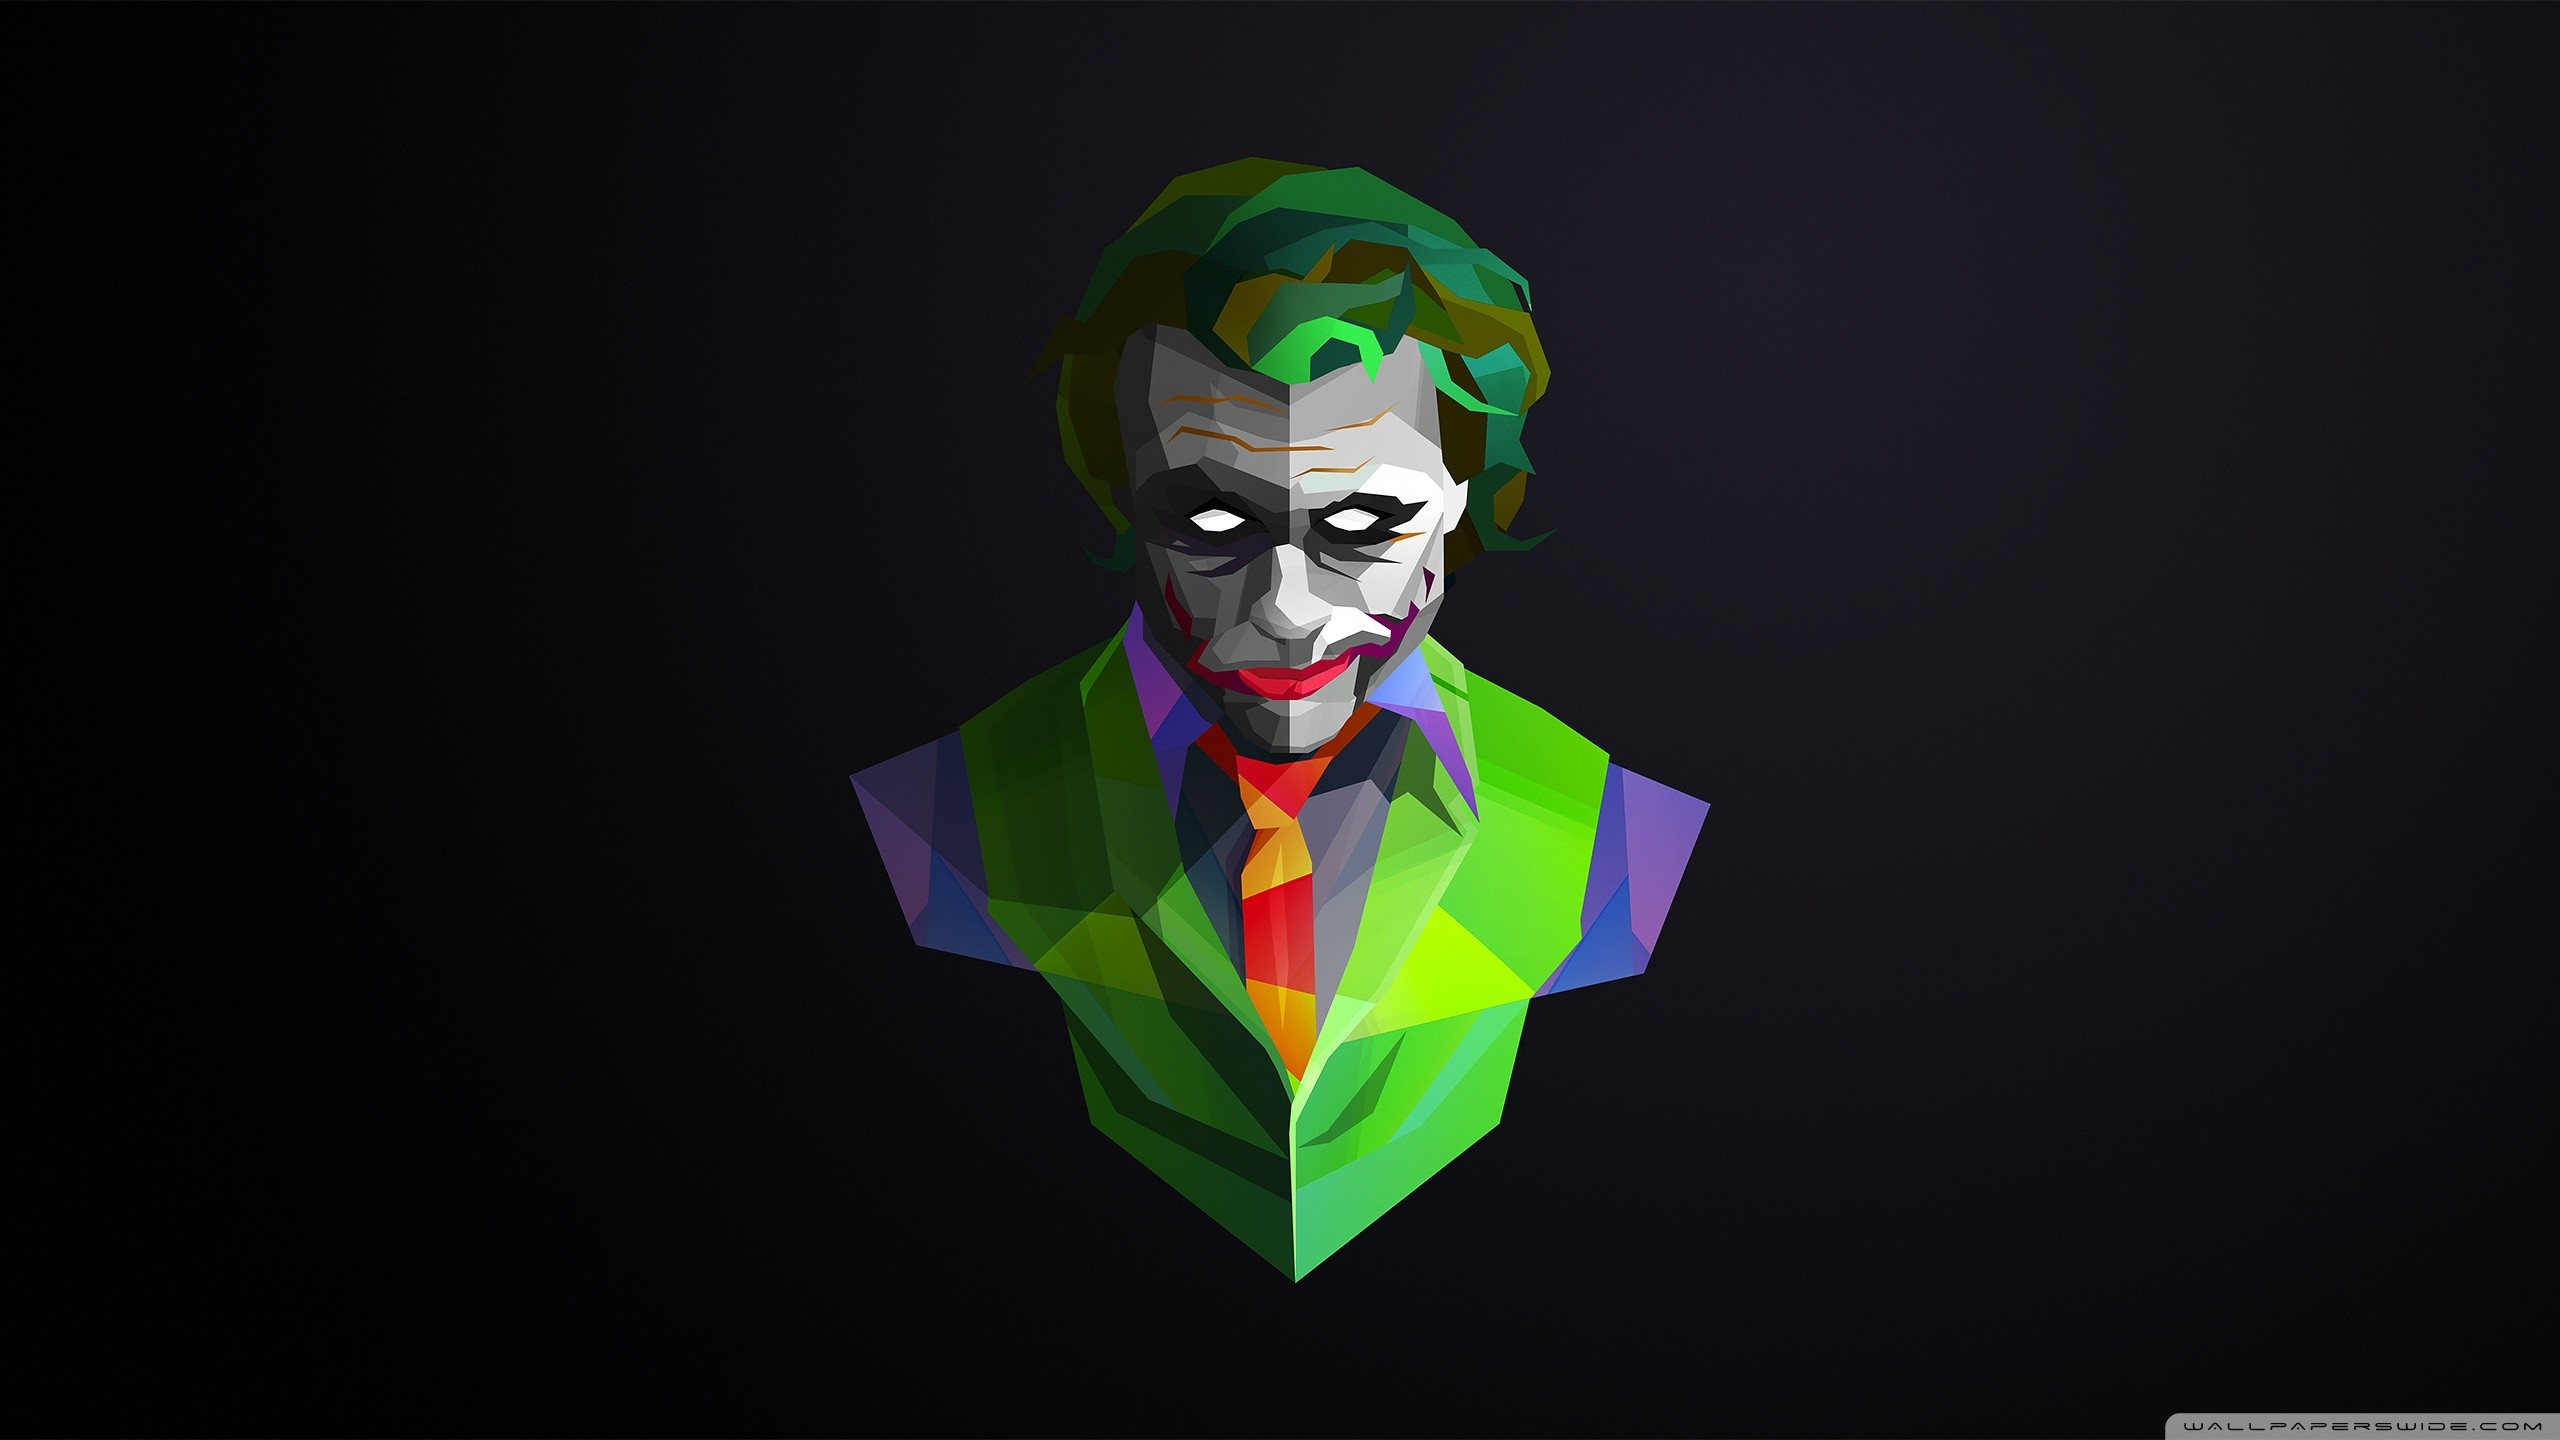 Joker Hd Wallpaper